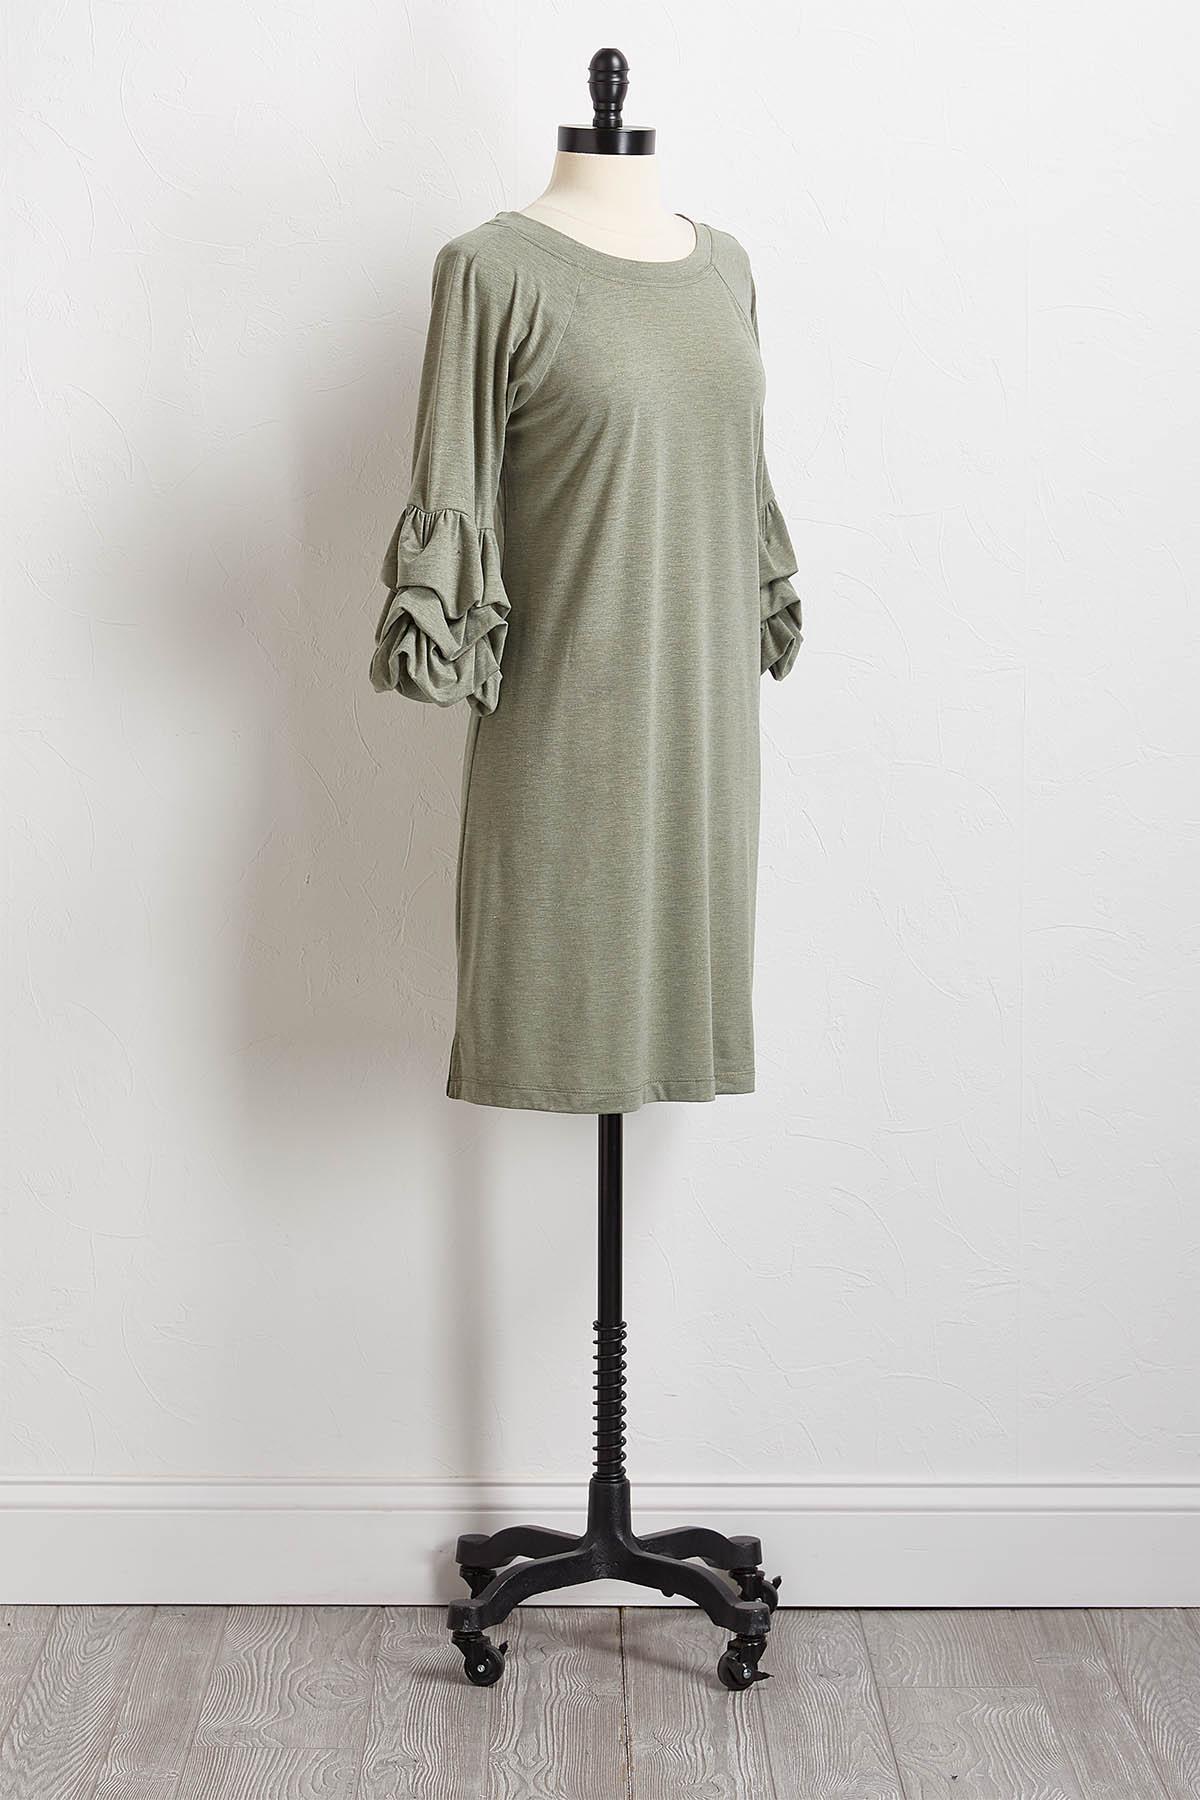 Shimmer Green Balloon Sleeve Dress